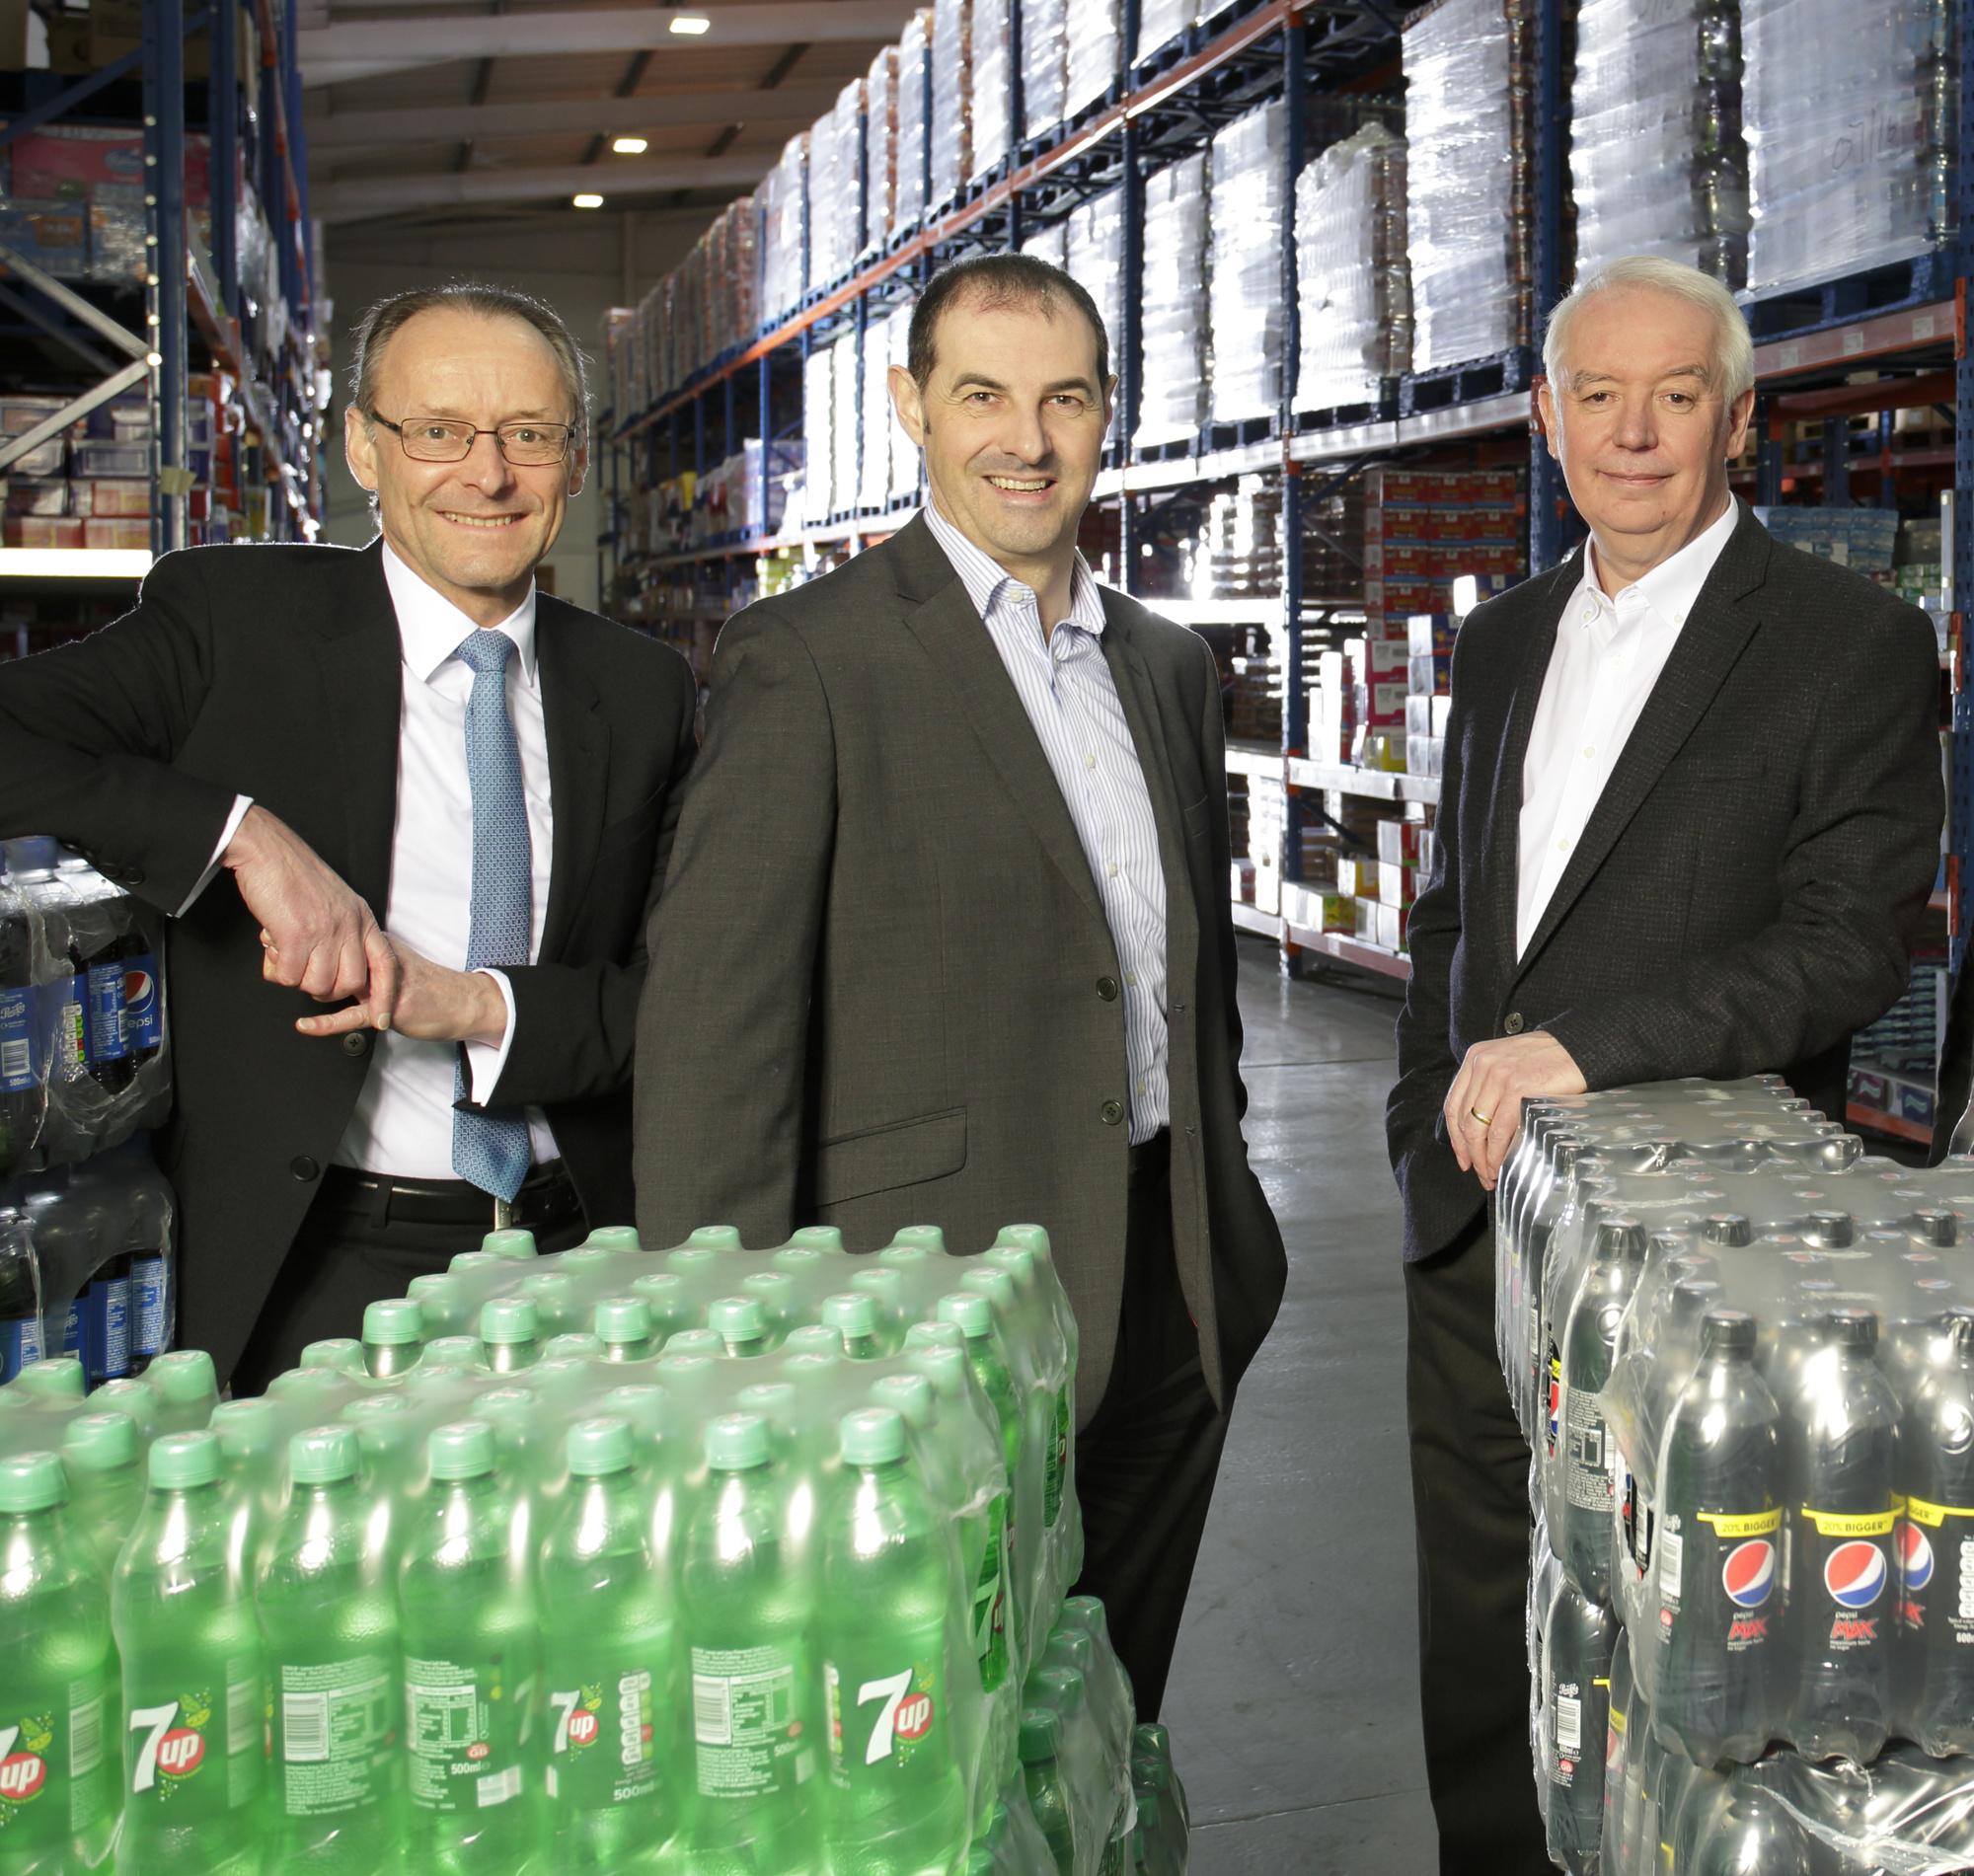 L-R Hugh Welch, Muckle; David Brind, Kitwave FD; Paul Young, Kitwave CEO